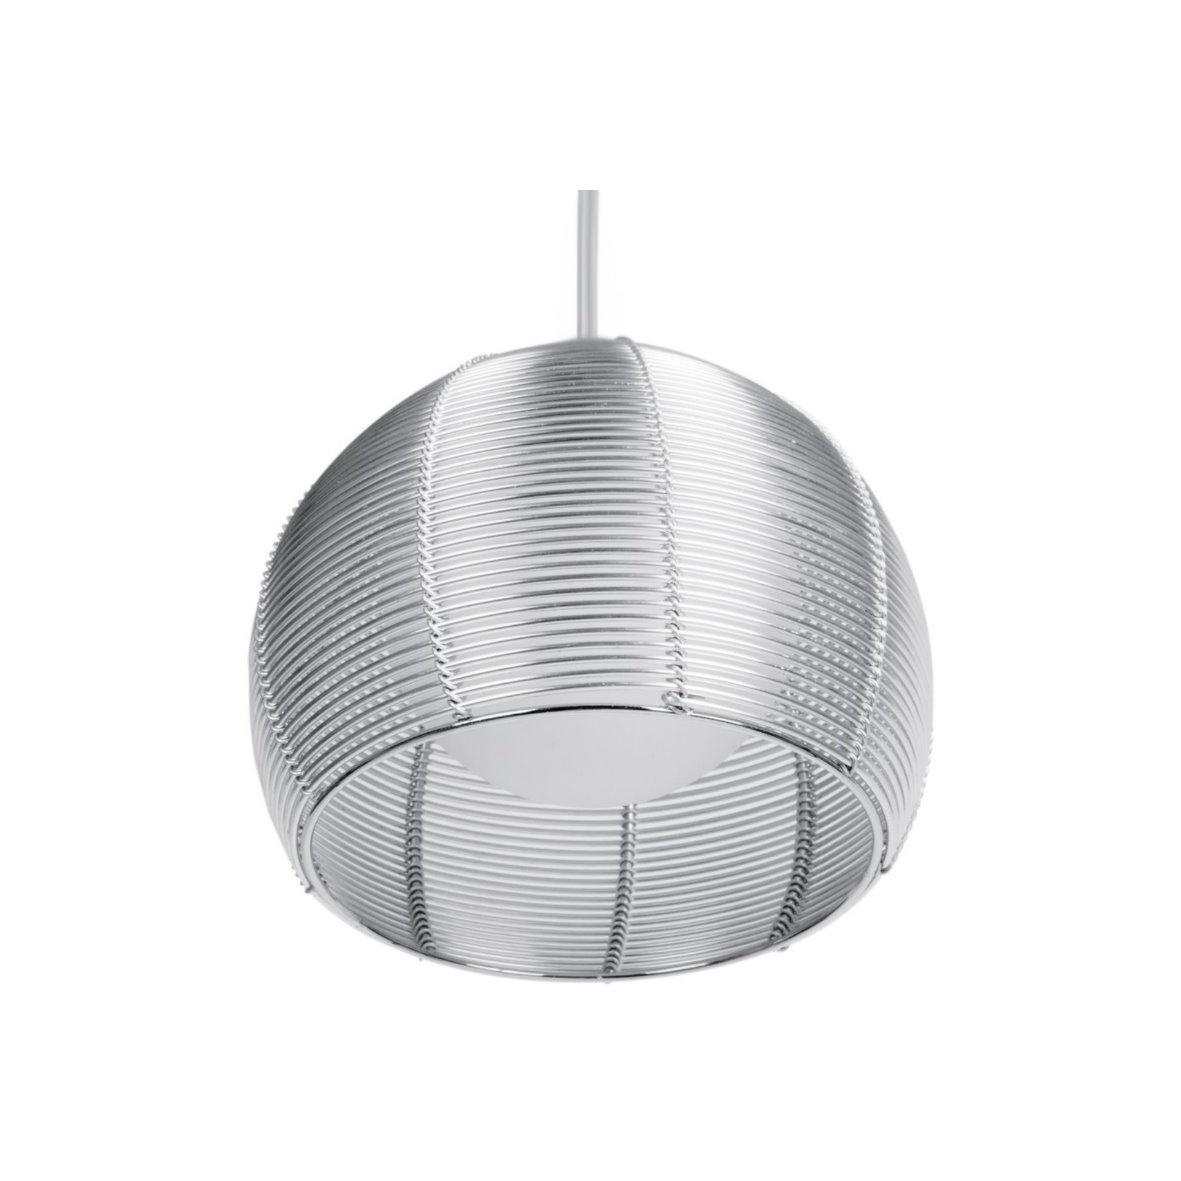 Pendelleuchte leuchte lampe deckenlampe retroleuchte for Deckenlampe e27